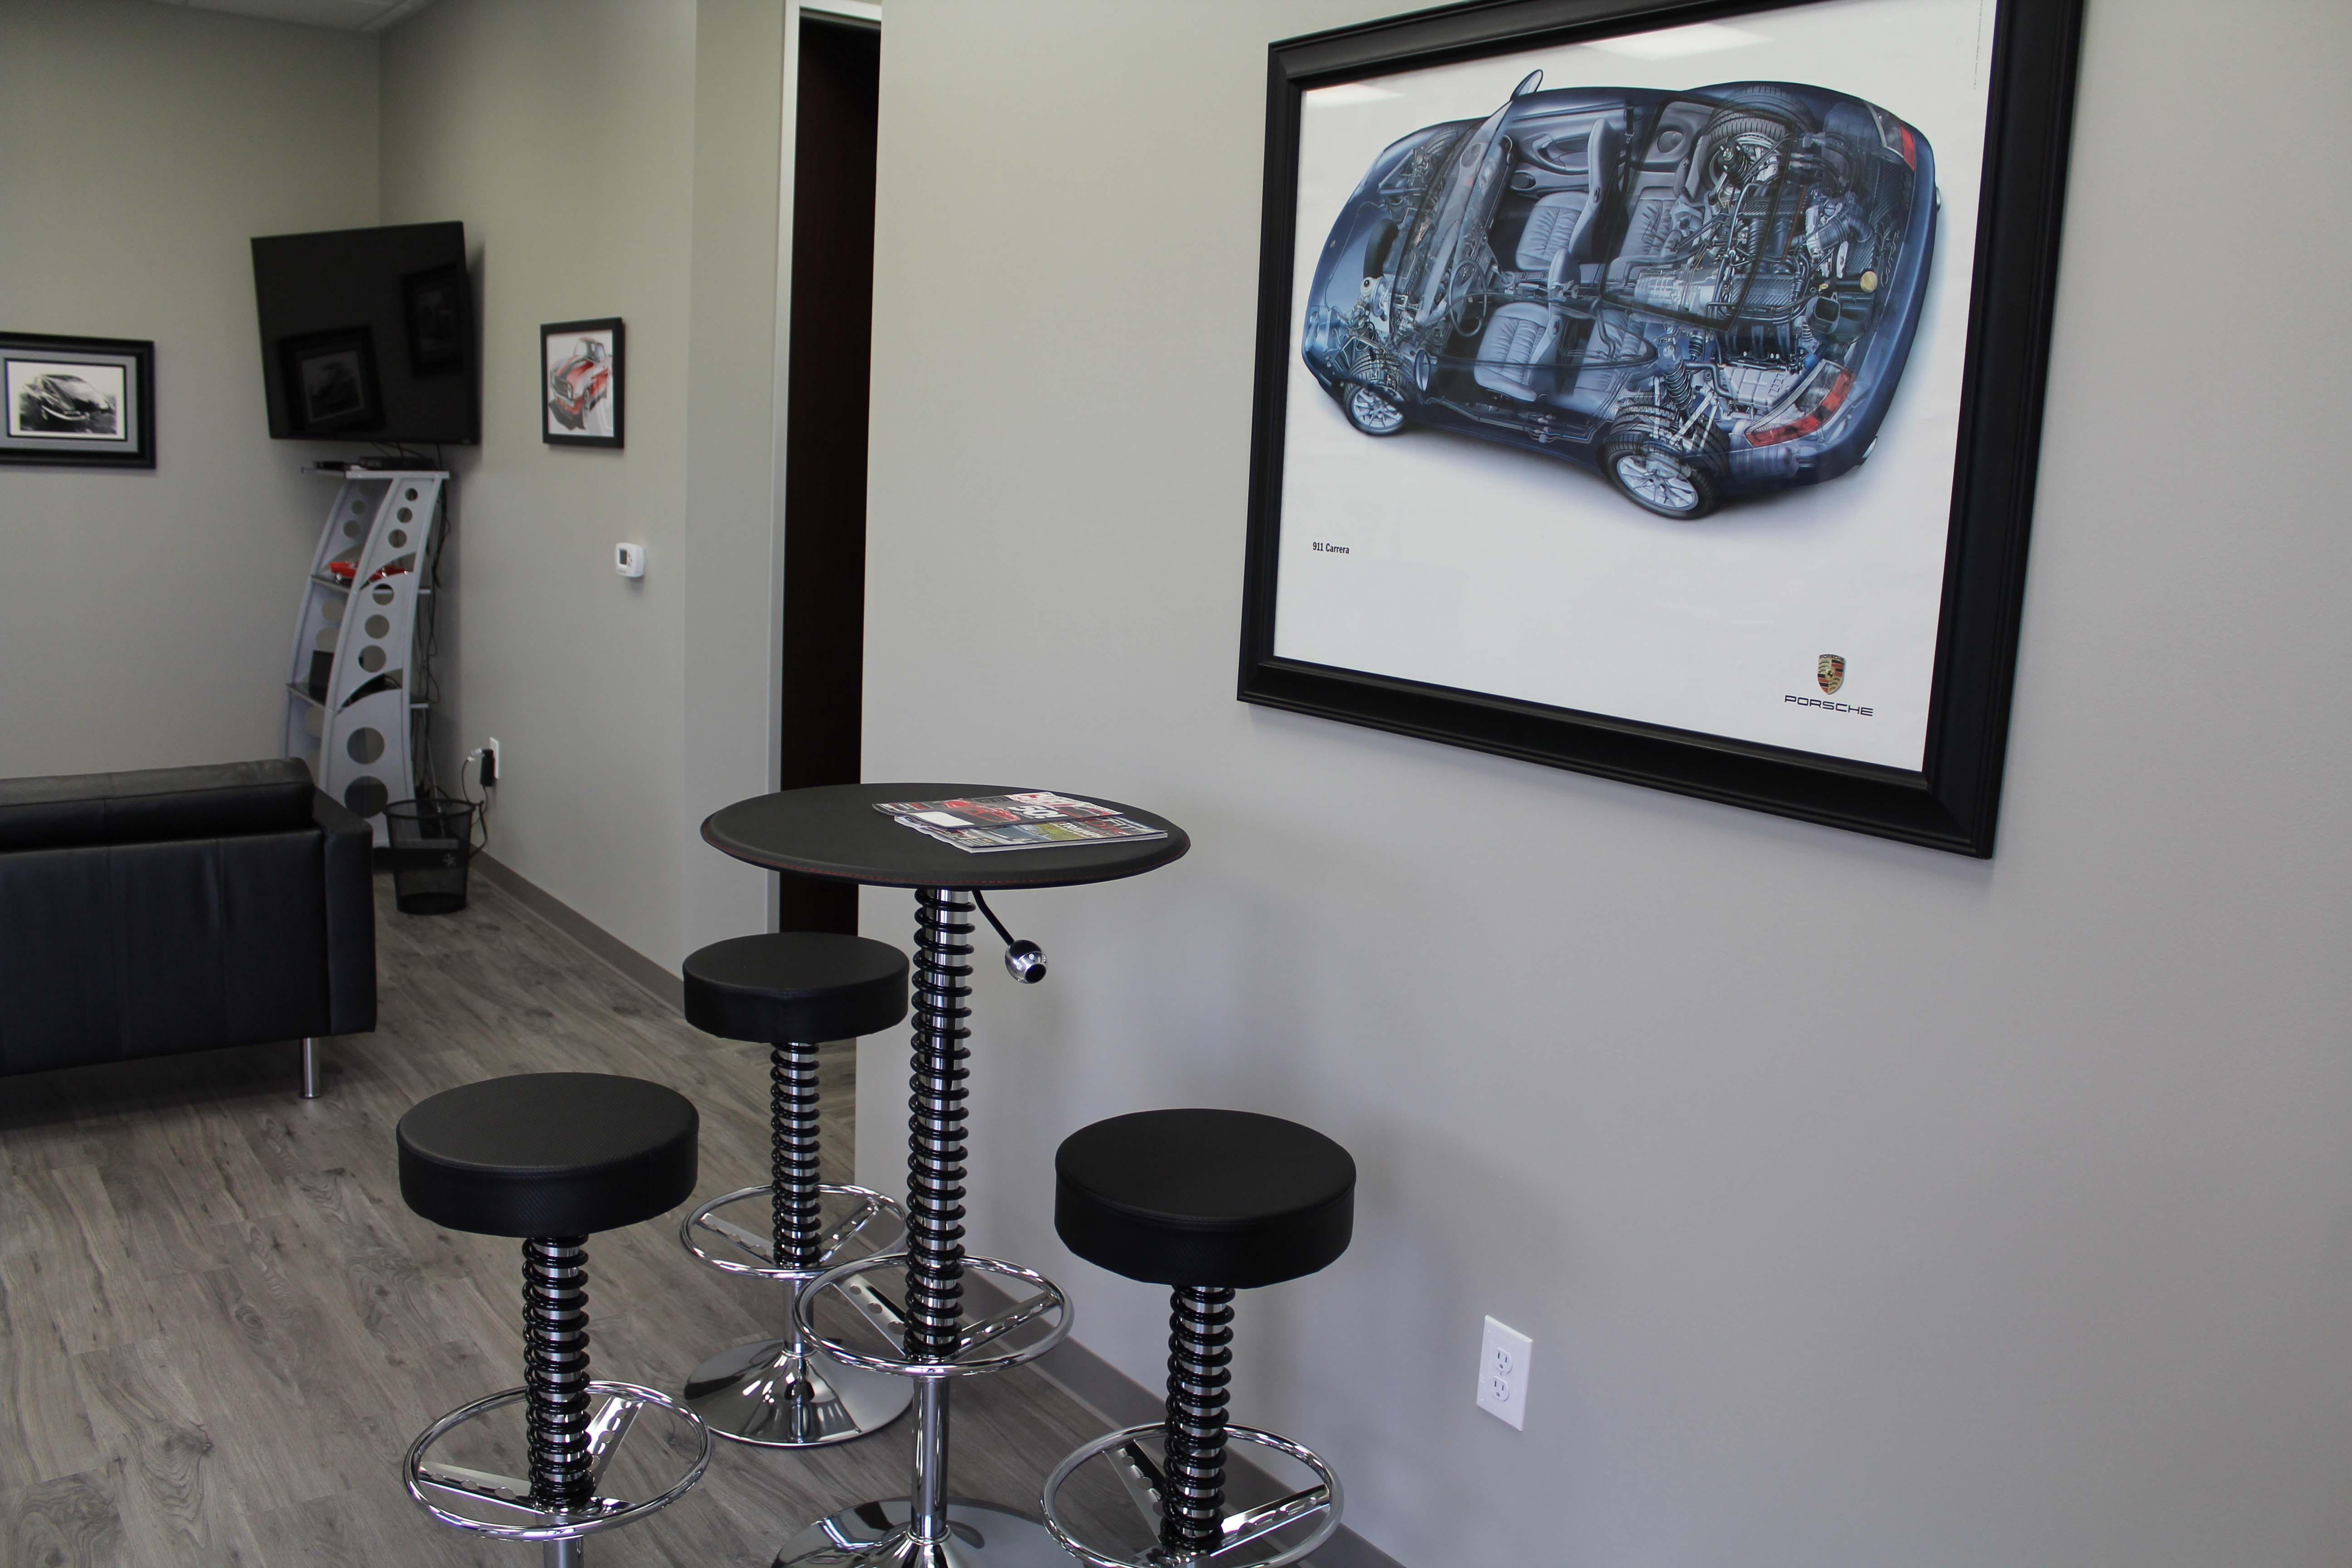 IMG_8751 - Porsche Picture